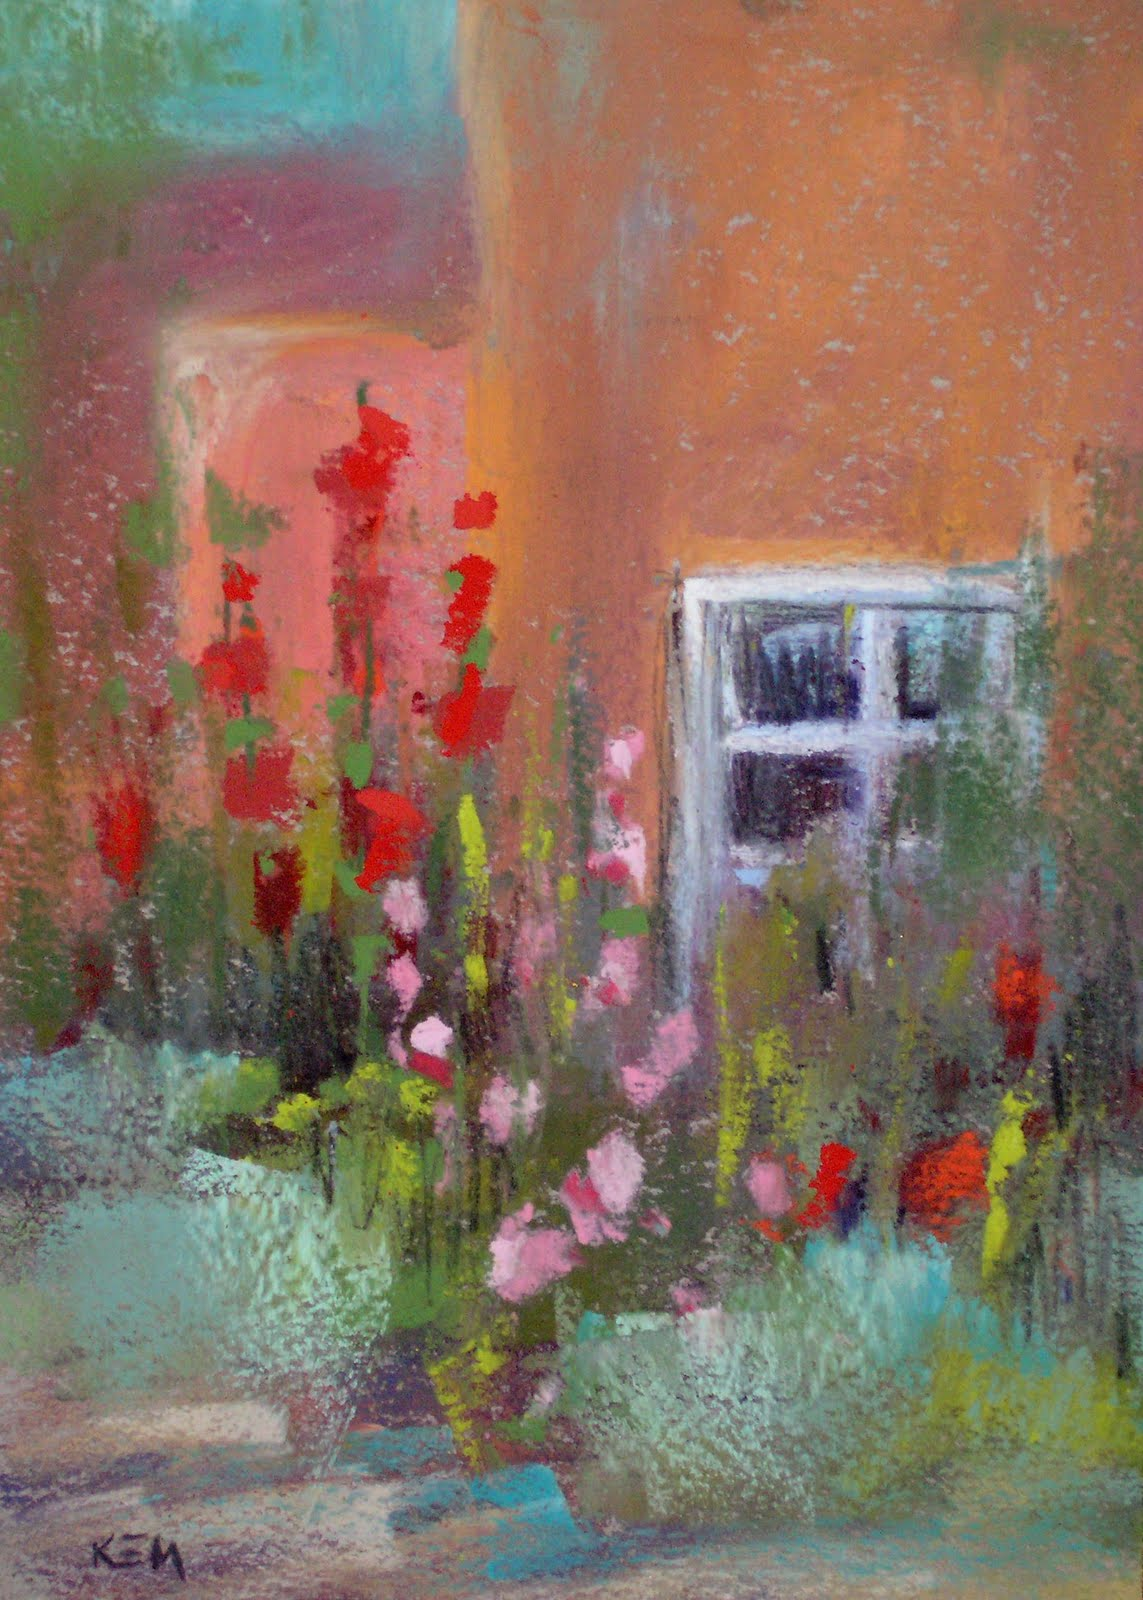 """Old Town Albuqurque 5x7 pastel"" original fine art by Karen Margulis"